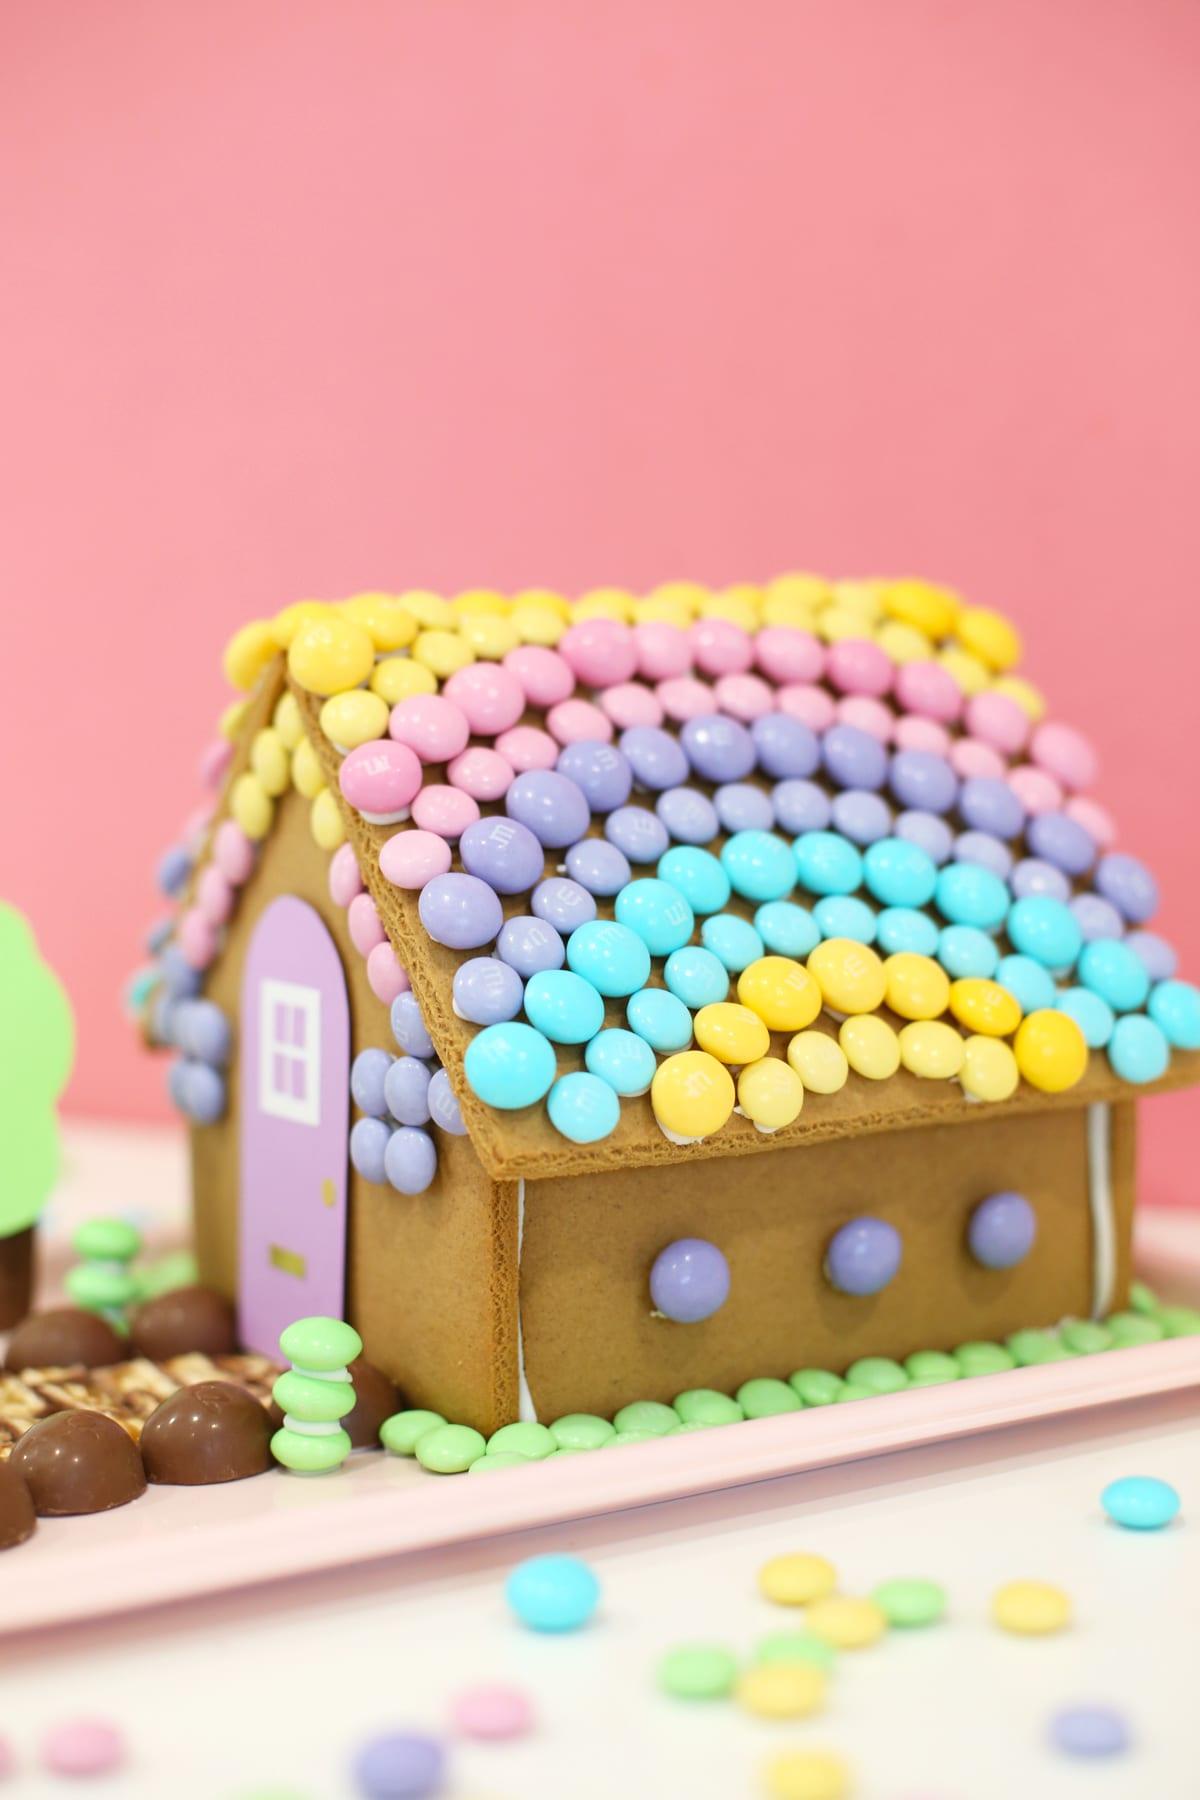 diy-easter-bunny-gingerbread-house-3.jpg